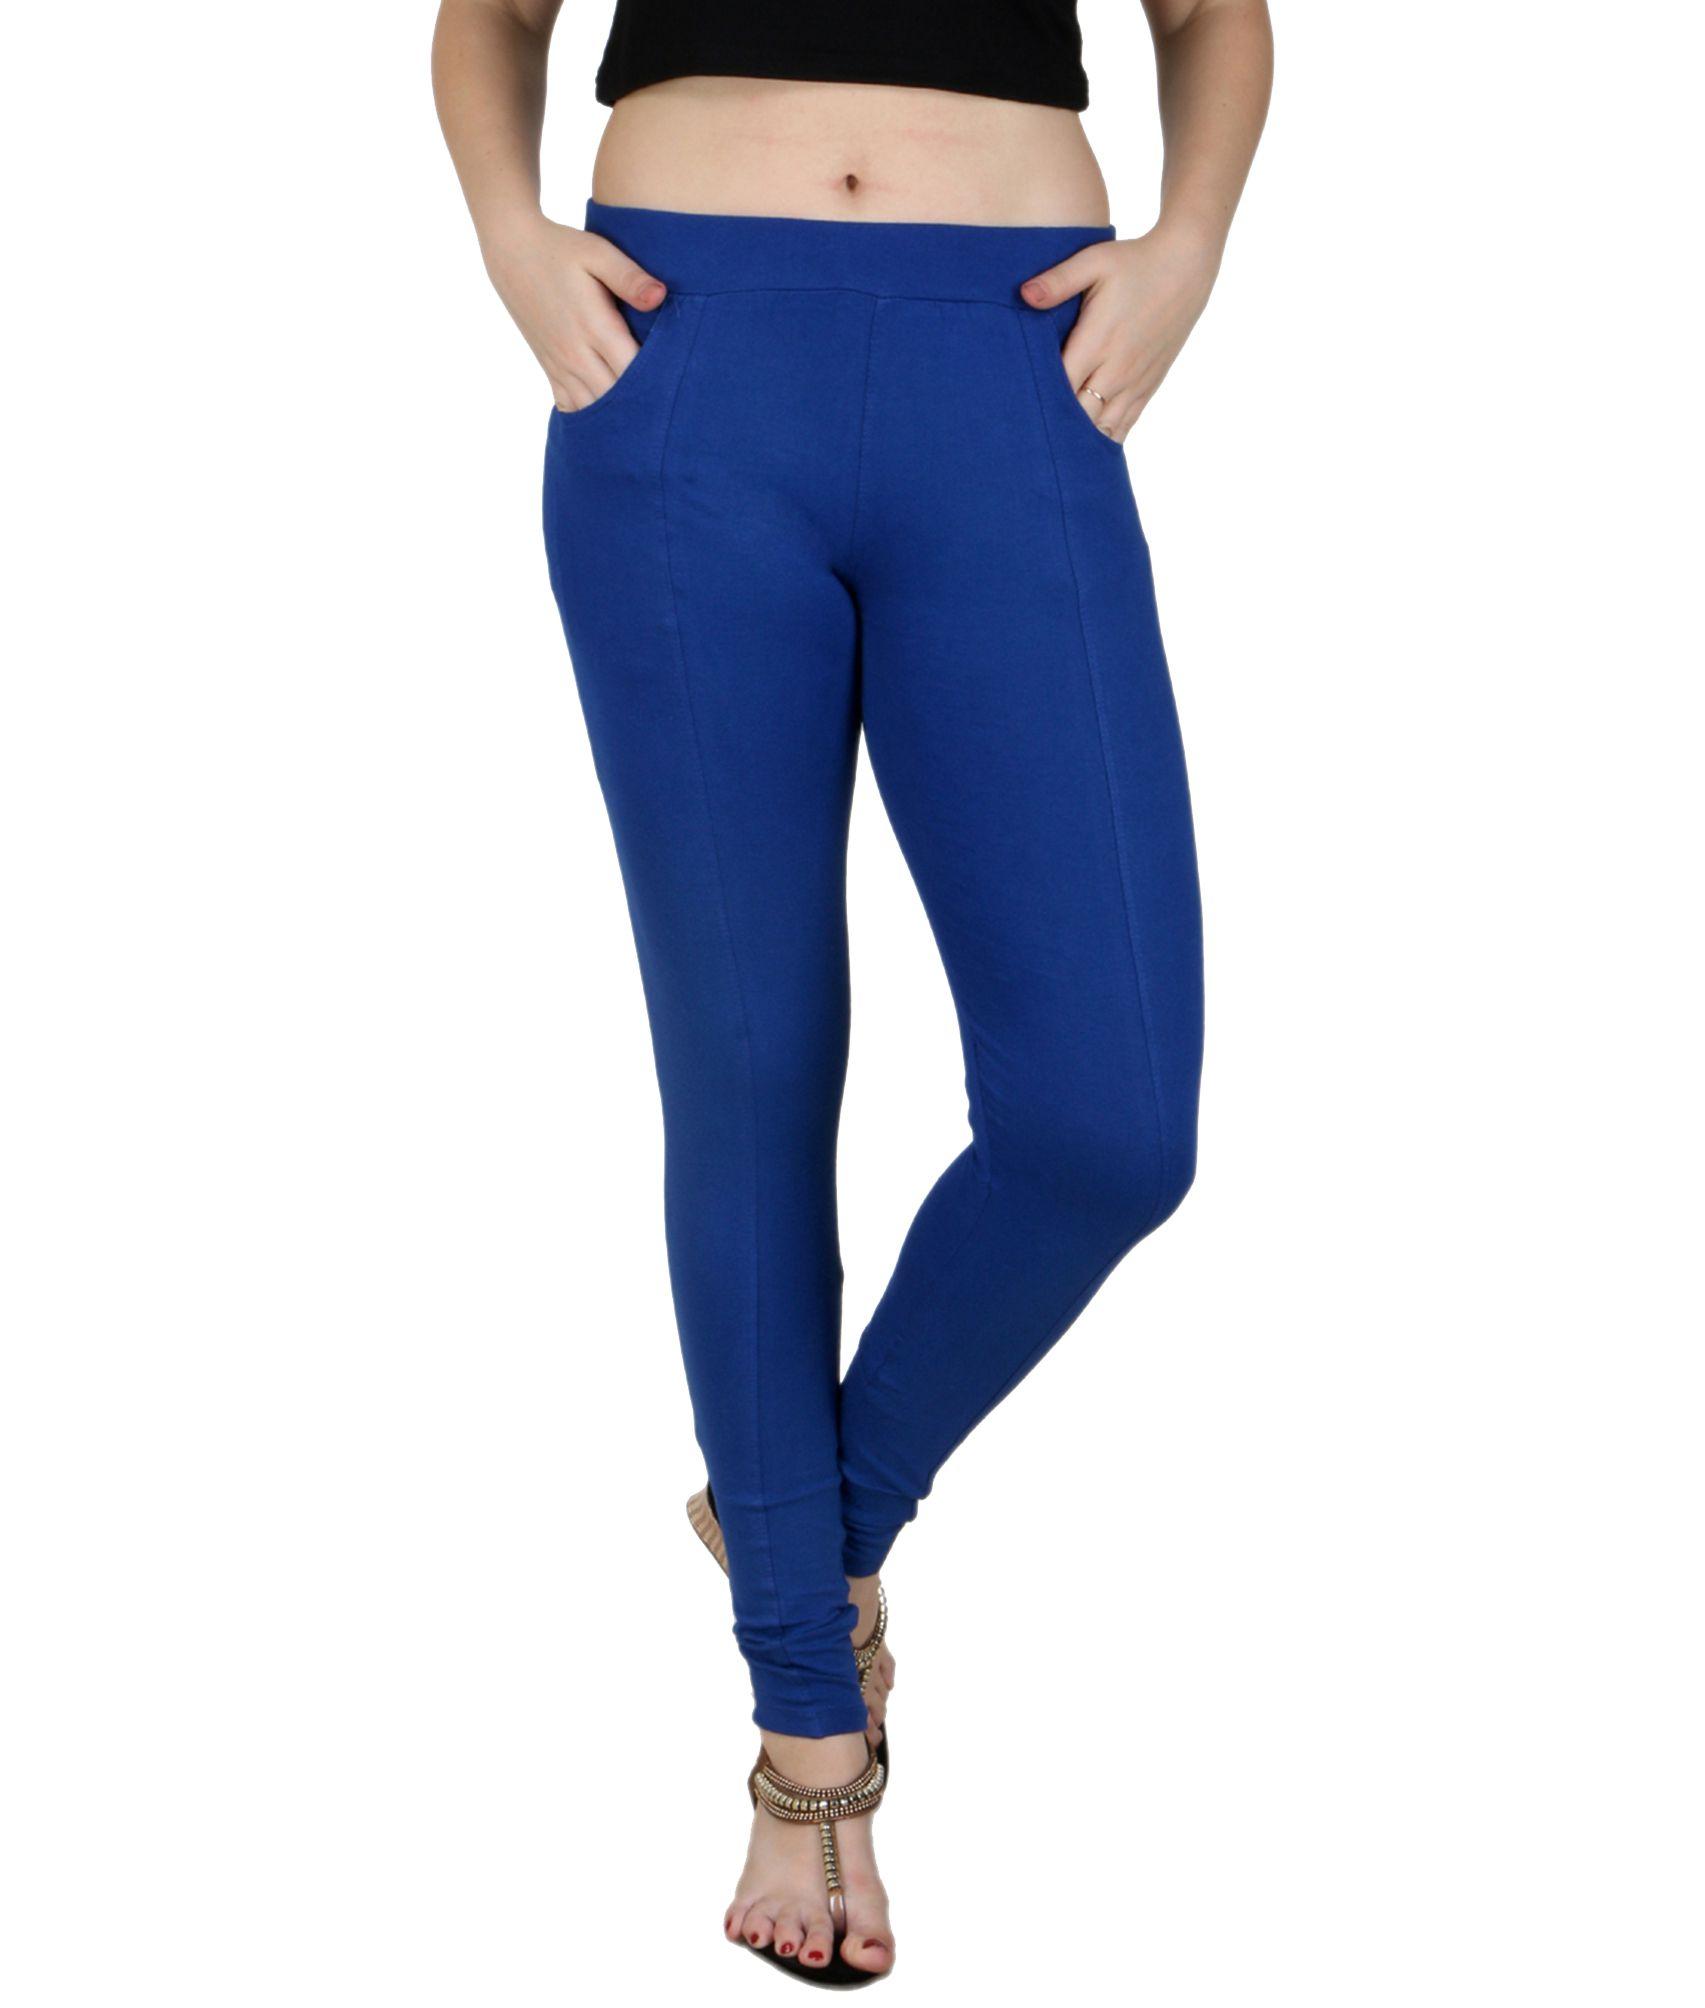 Baremoda Blue Cotton Lycra Jeggings